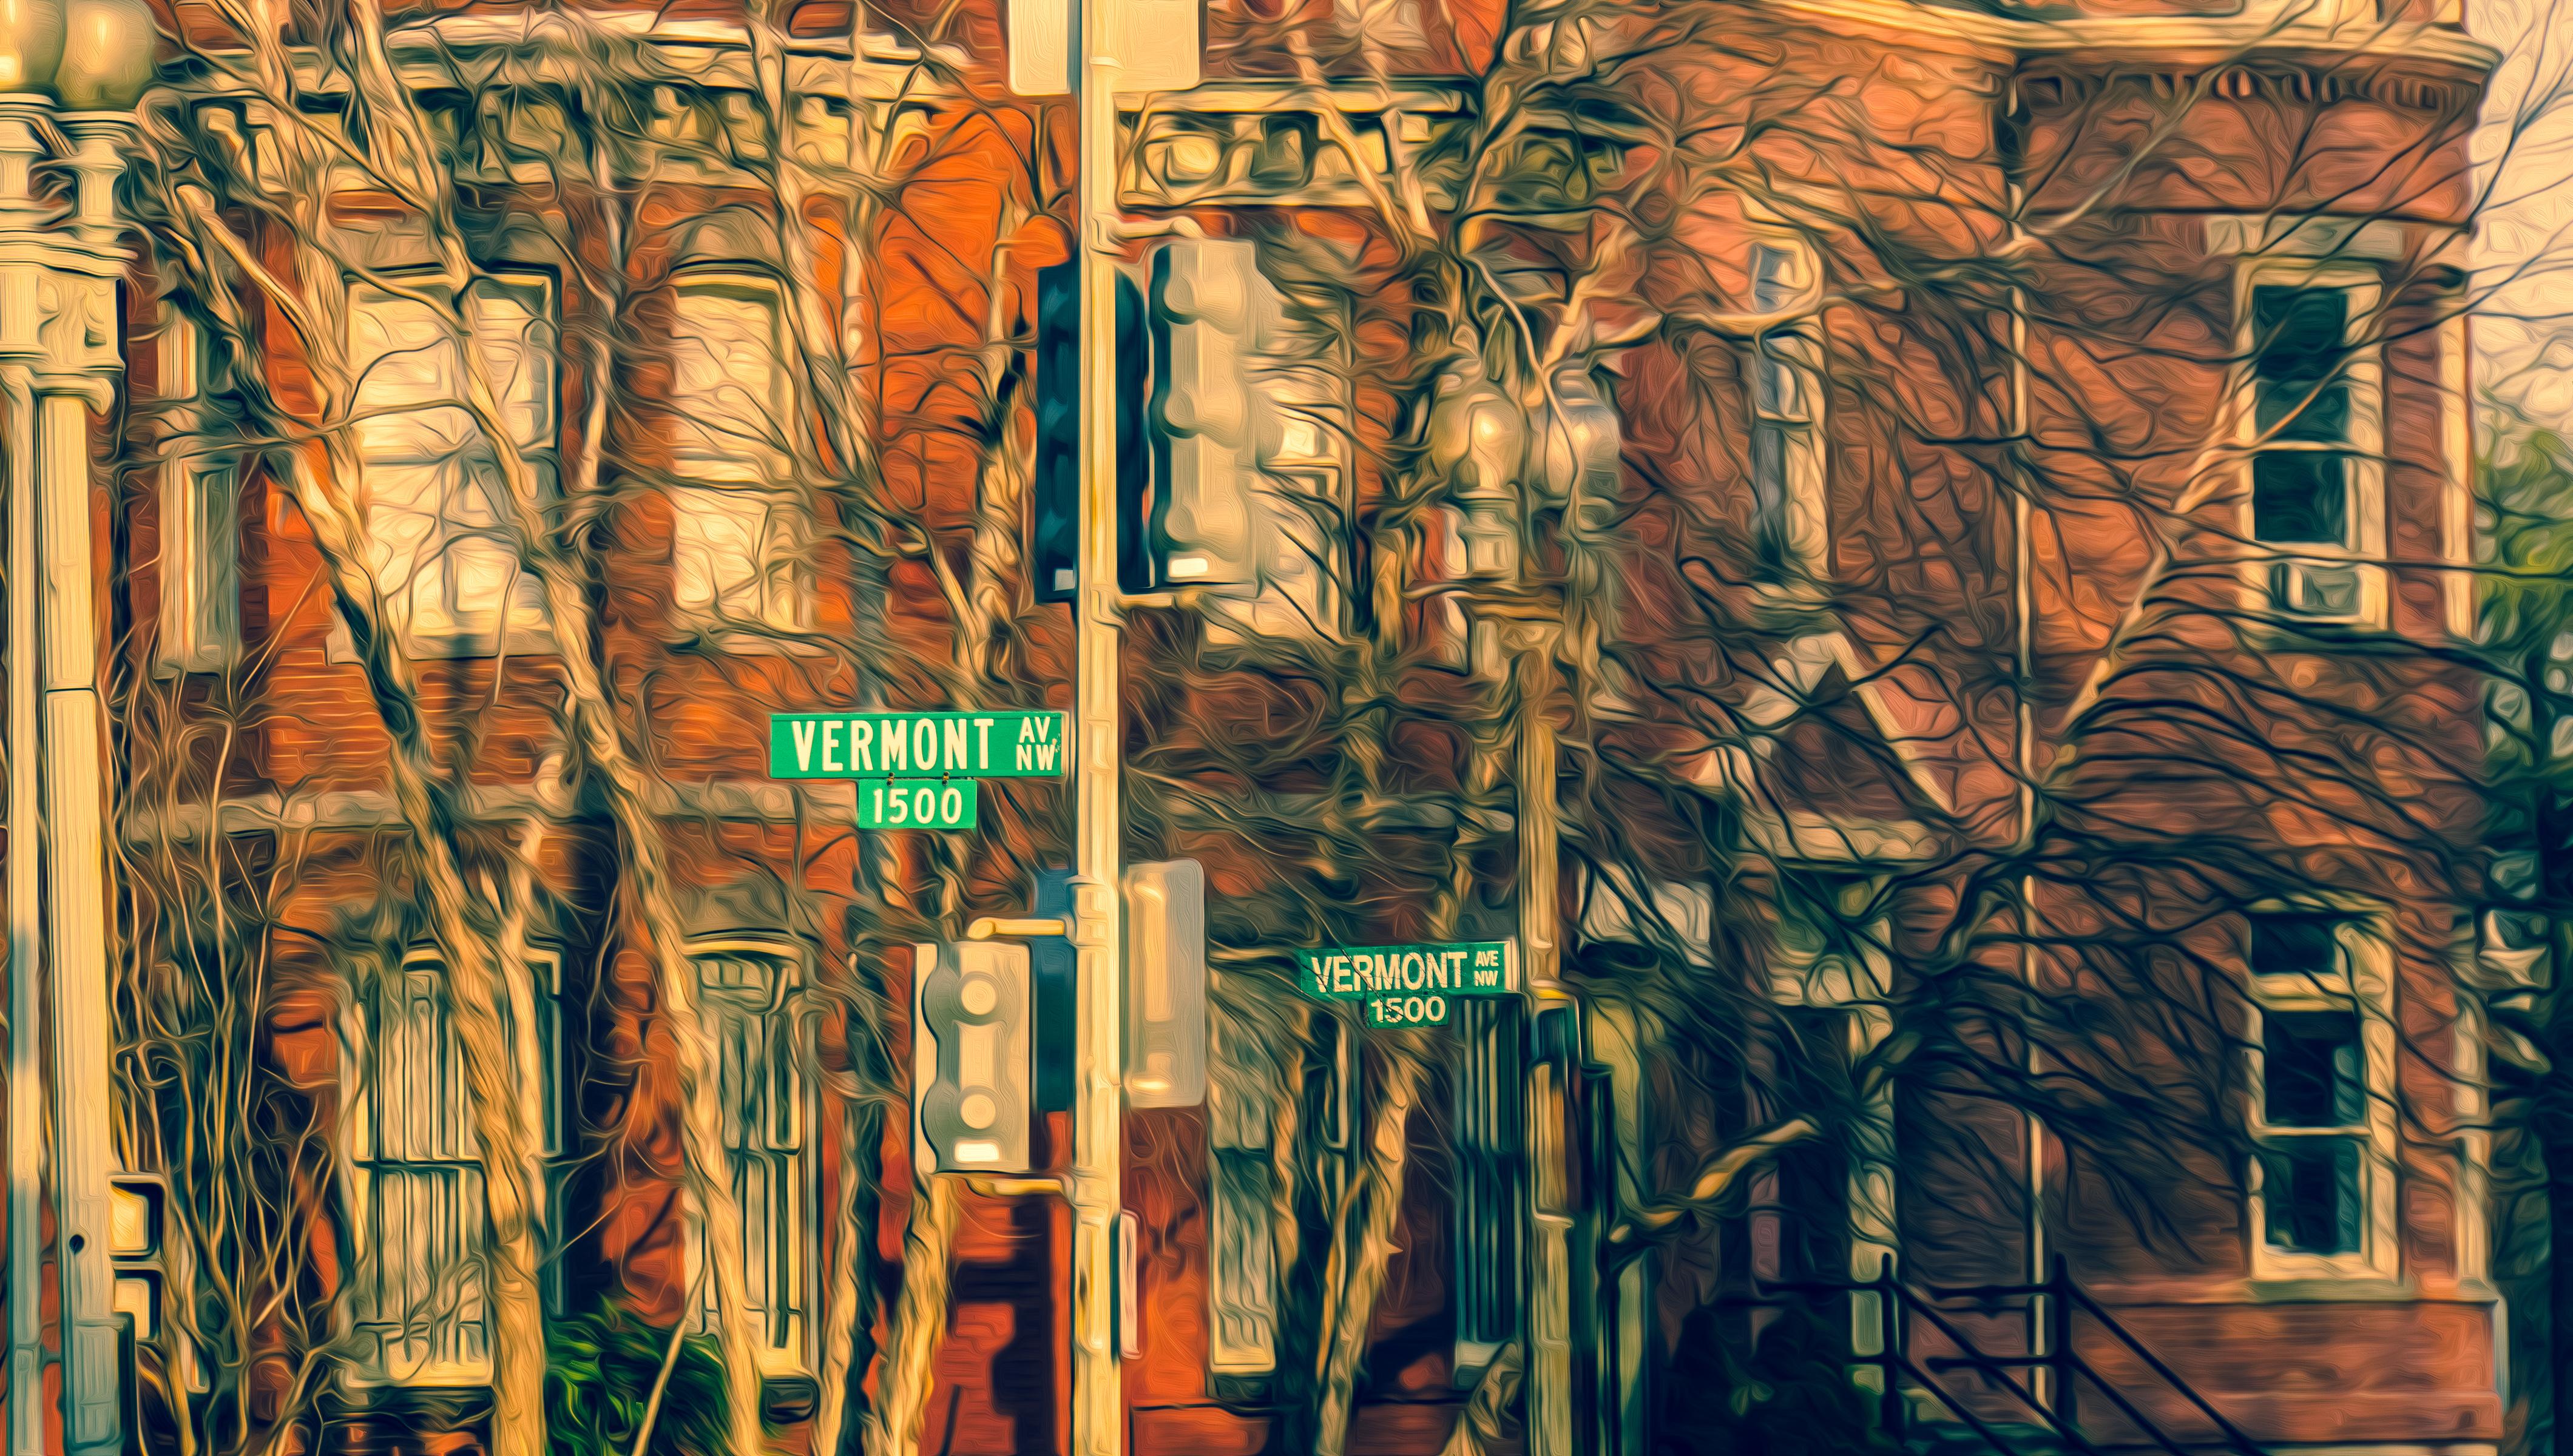 2016.03.24 Views of Vermont Avenue Washington DC USA 03